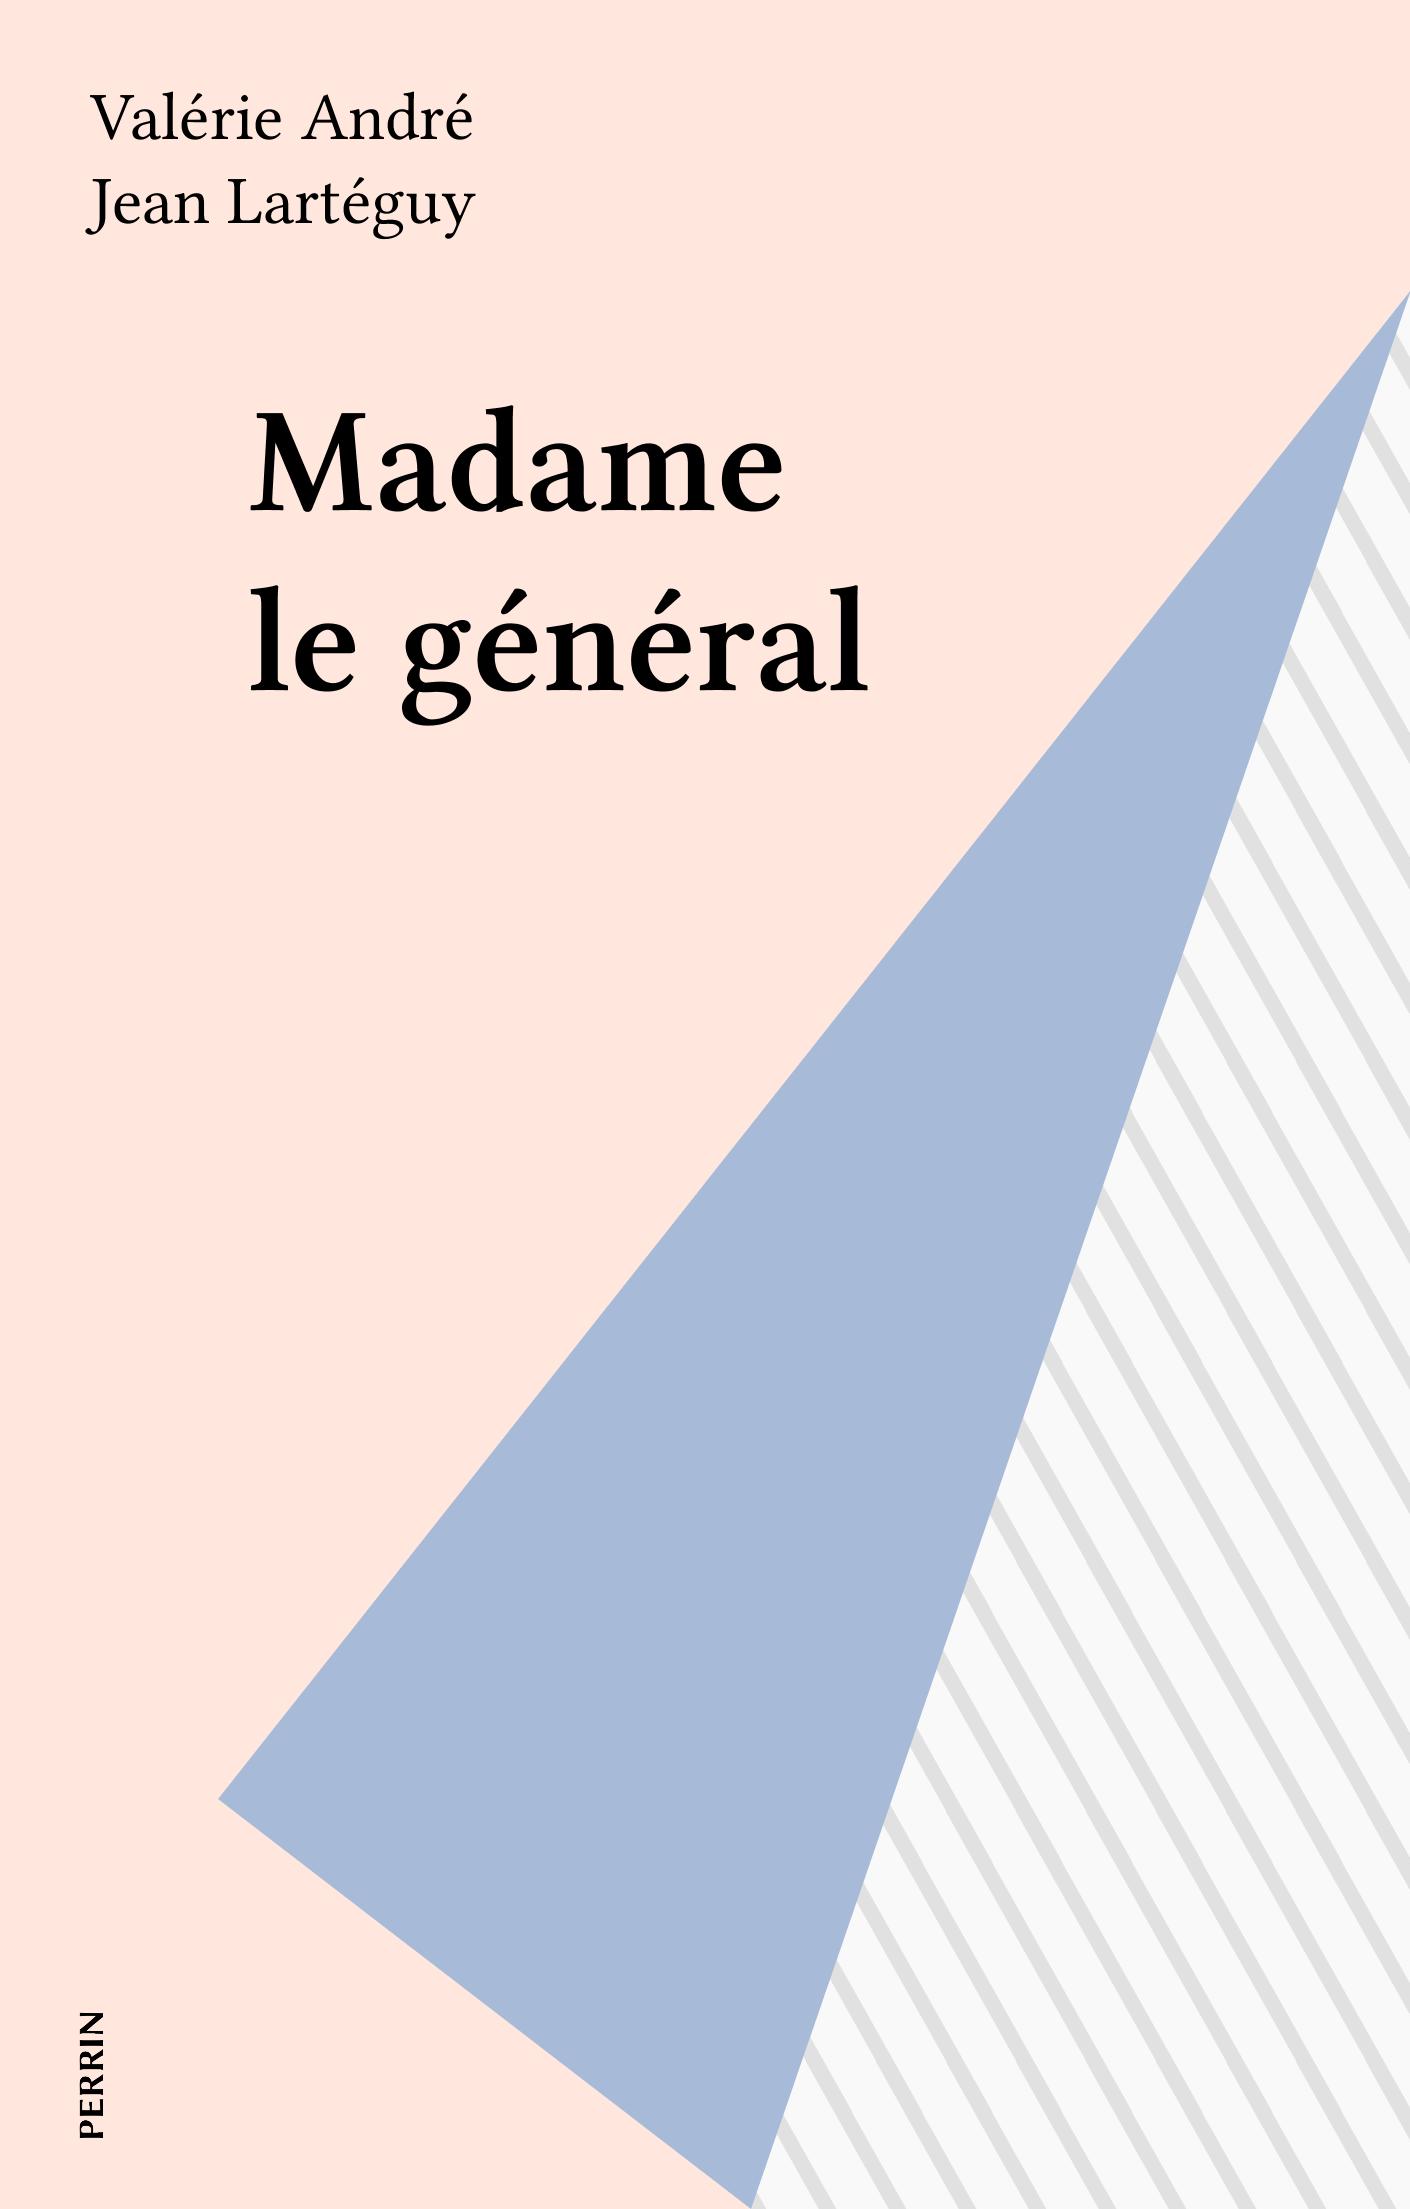 Madame le général